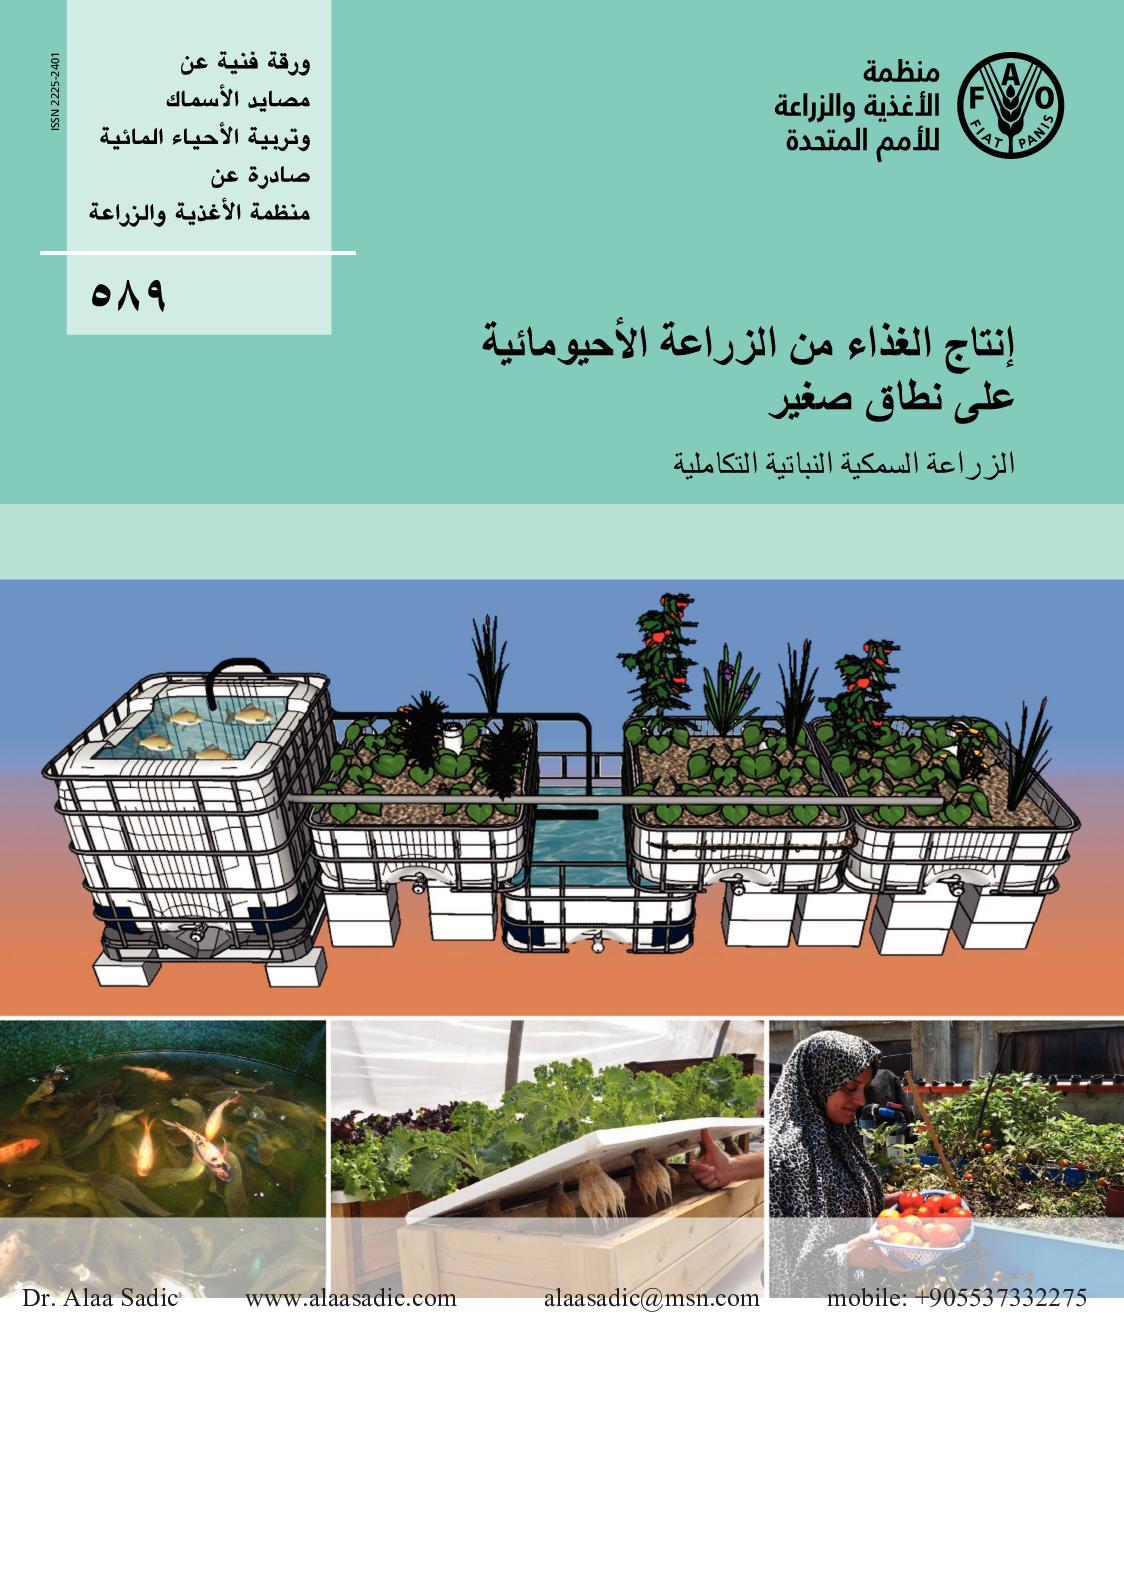 82da75fa1 Calaméo - إنتاج الغذاء من الزراعة الأحيومائية علي نطاق صغير